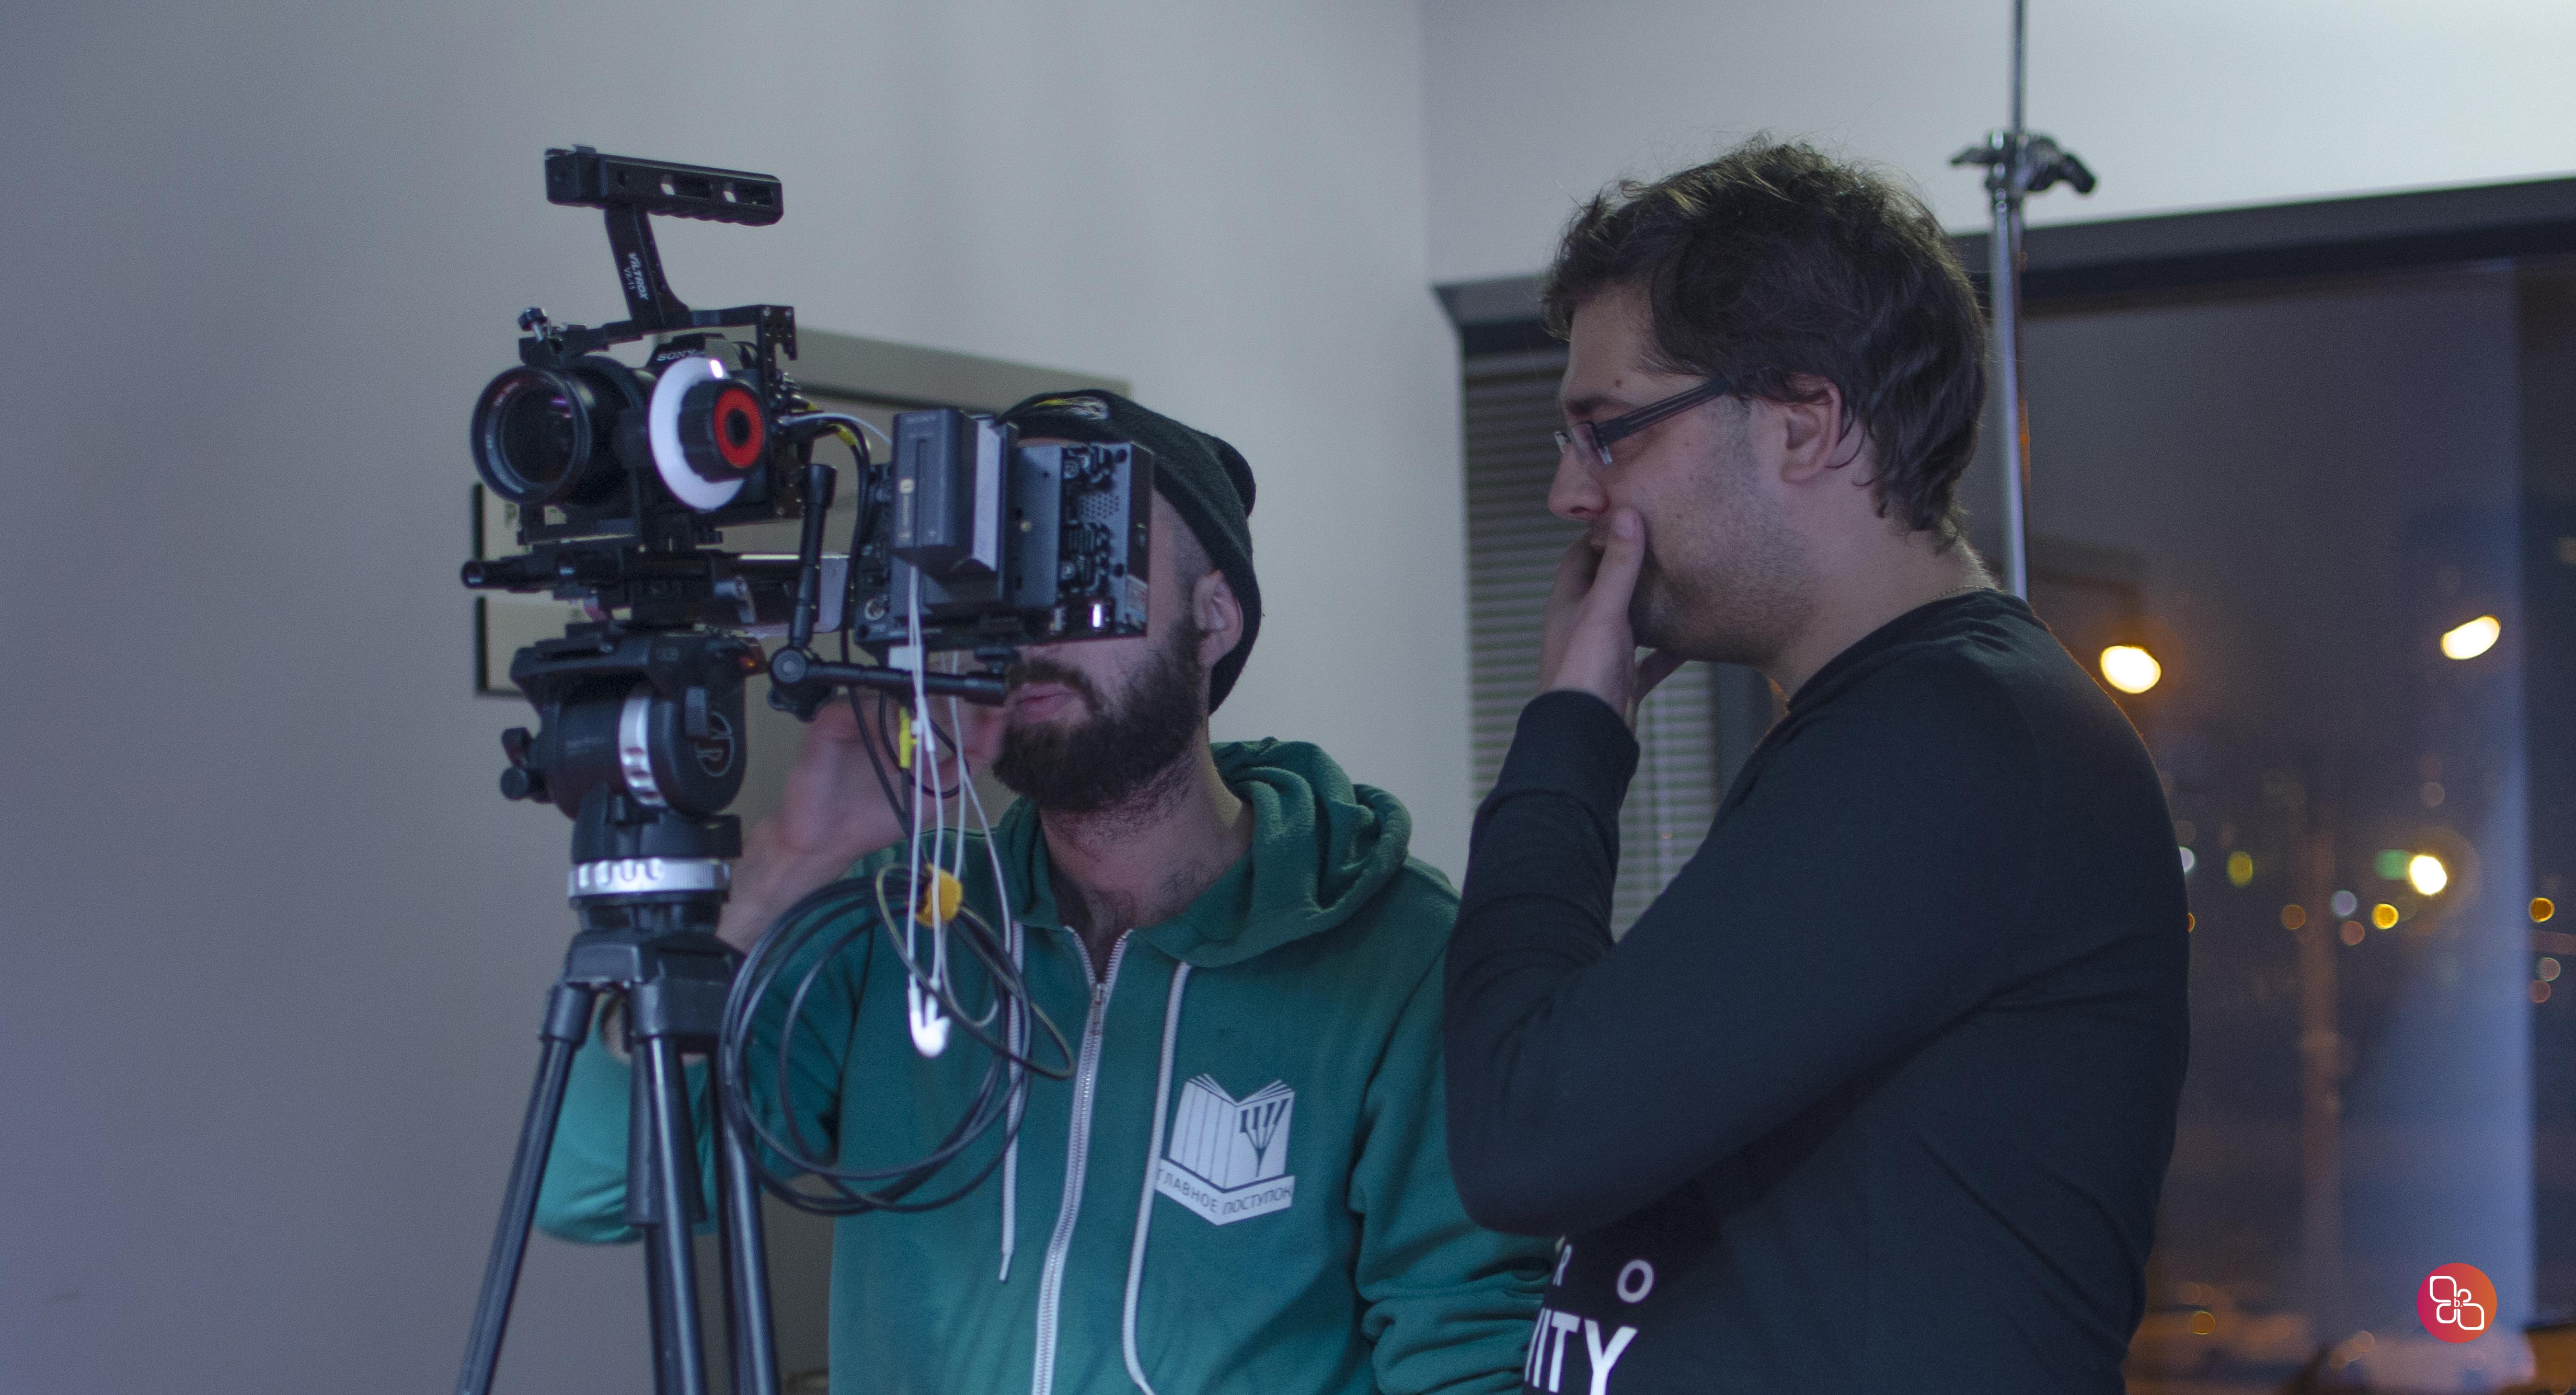 Backstage: Съемки нового проекта B3Fit